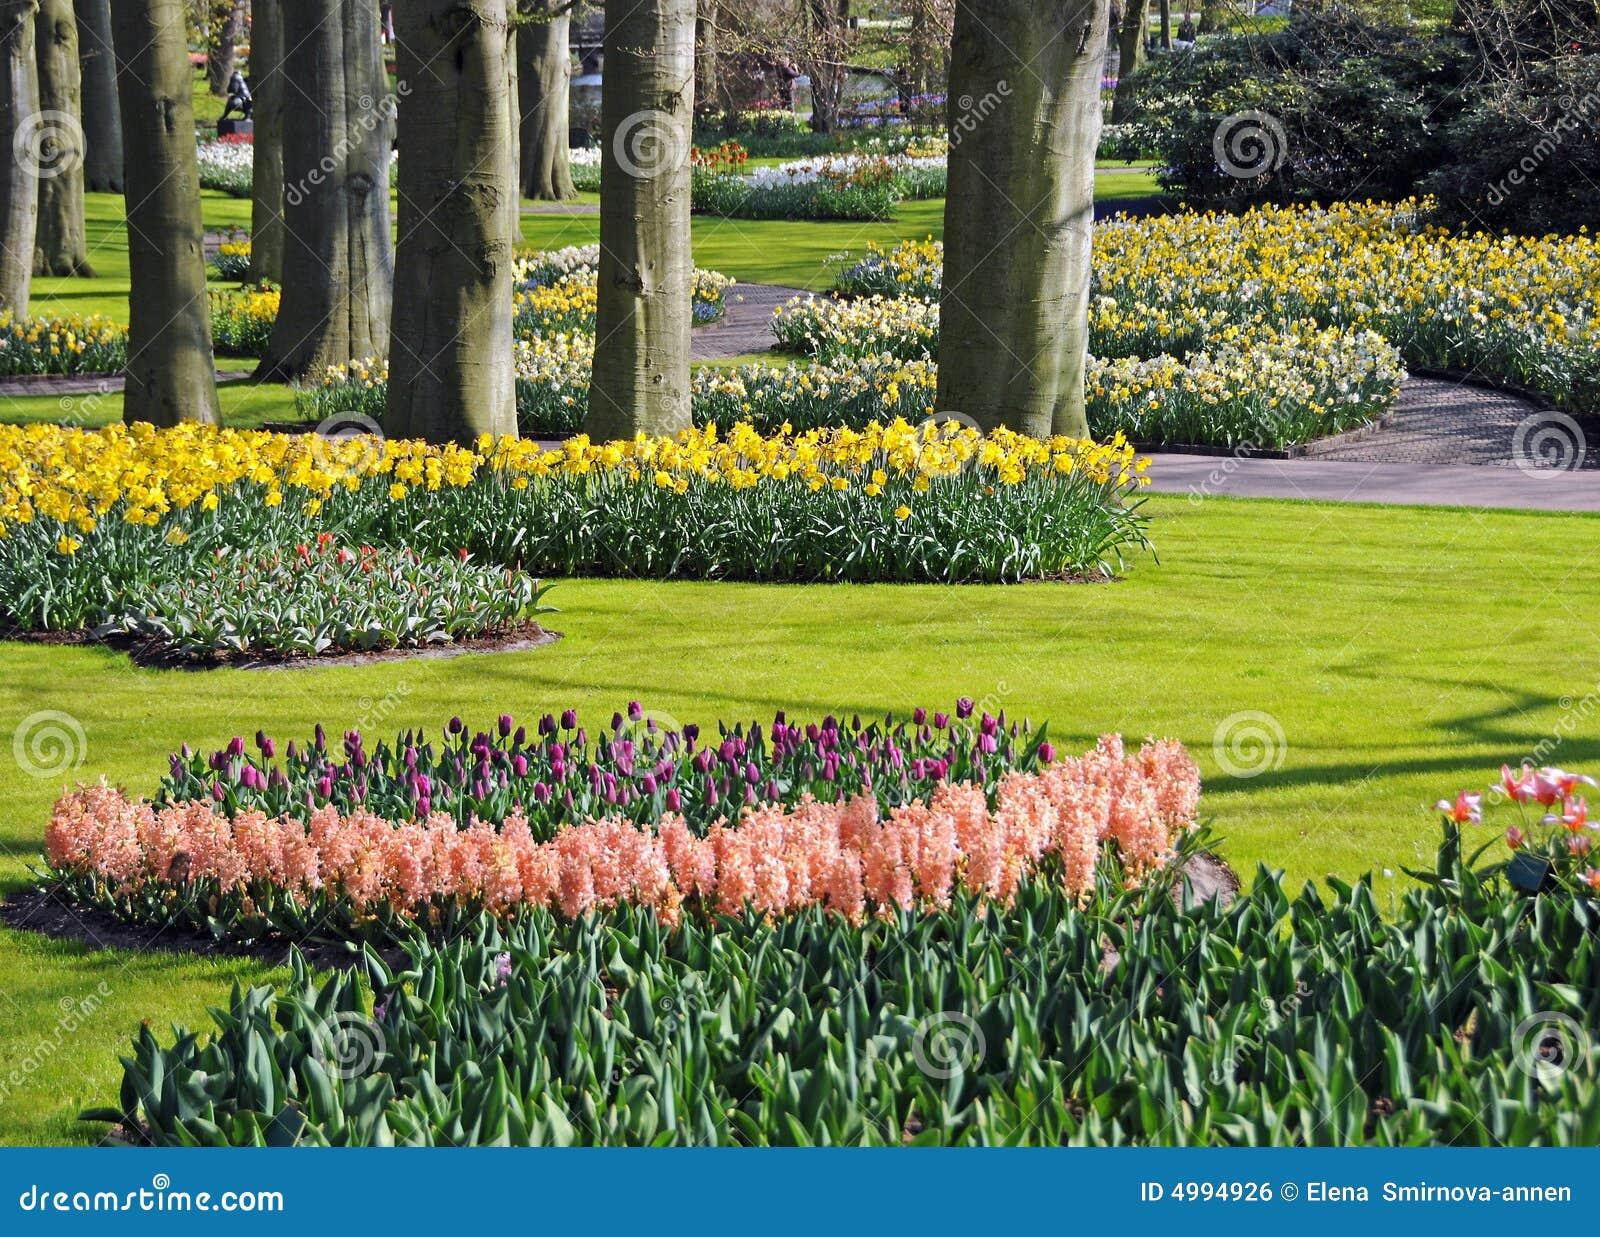 Free stock photo of garden - Beautiful Spring Garden